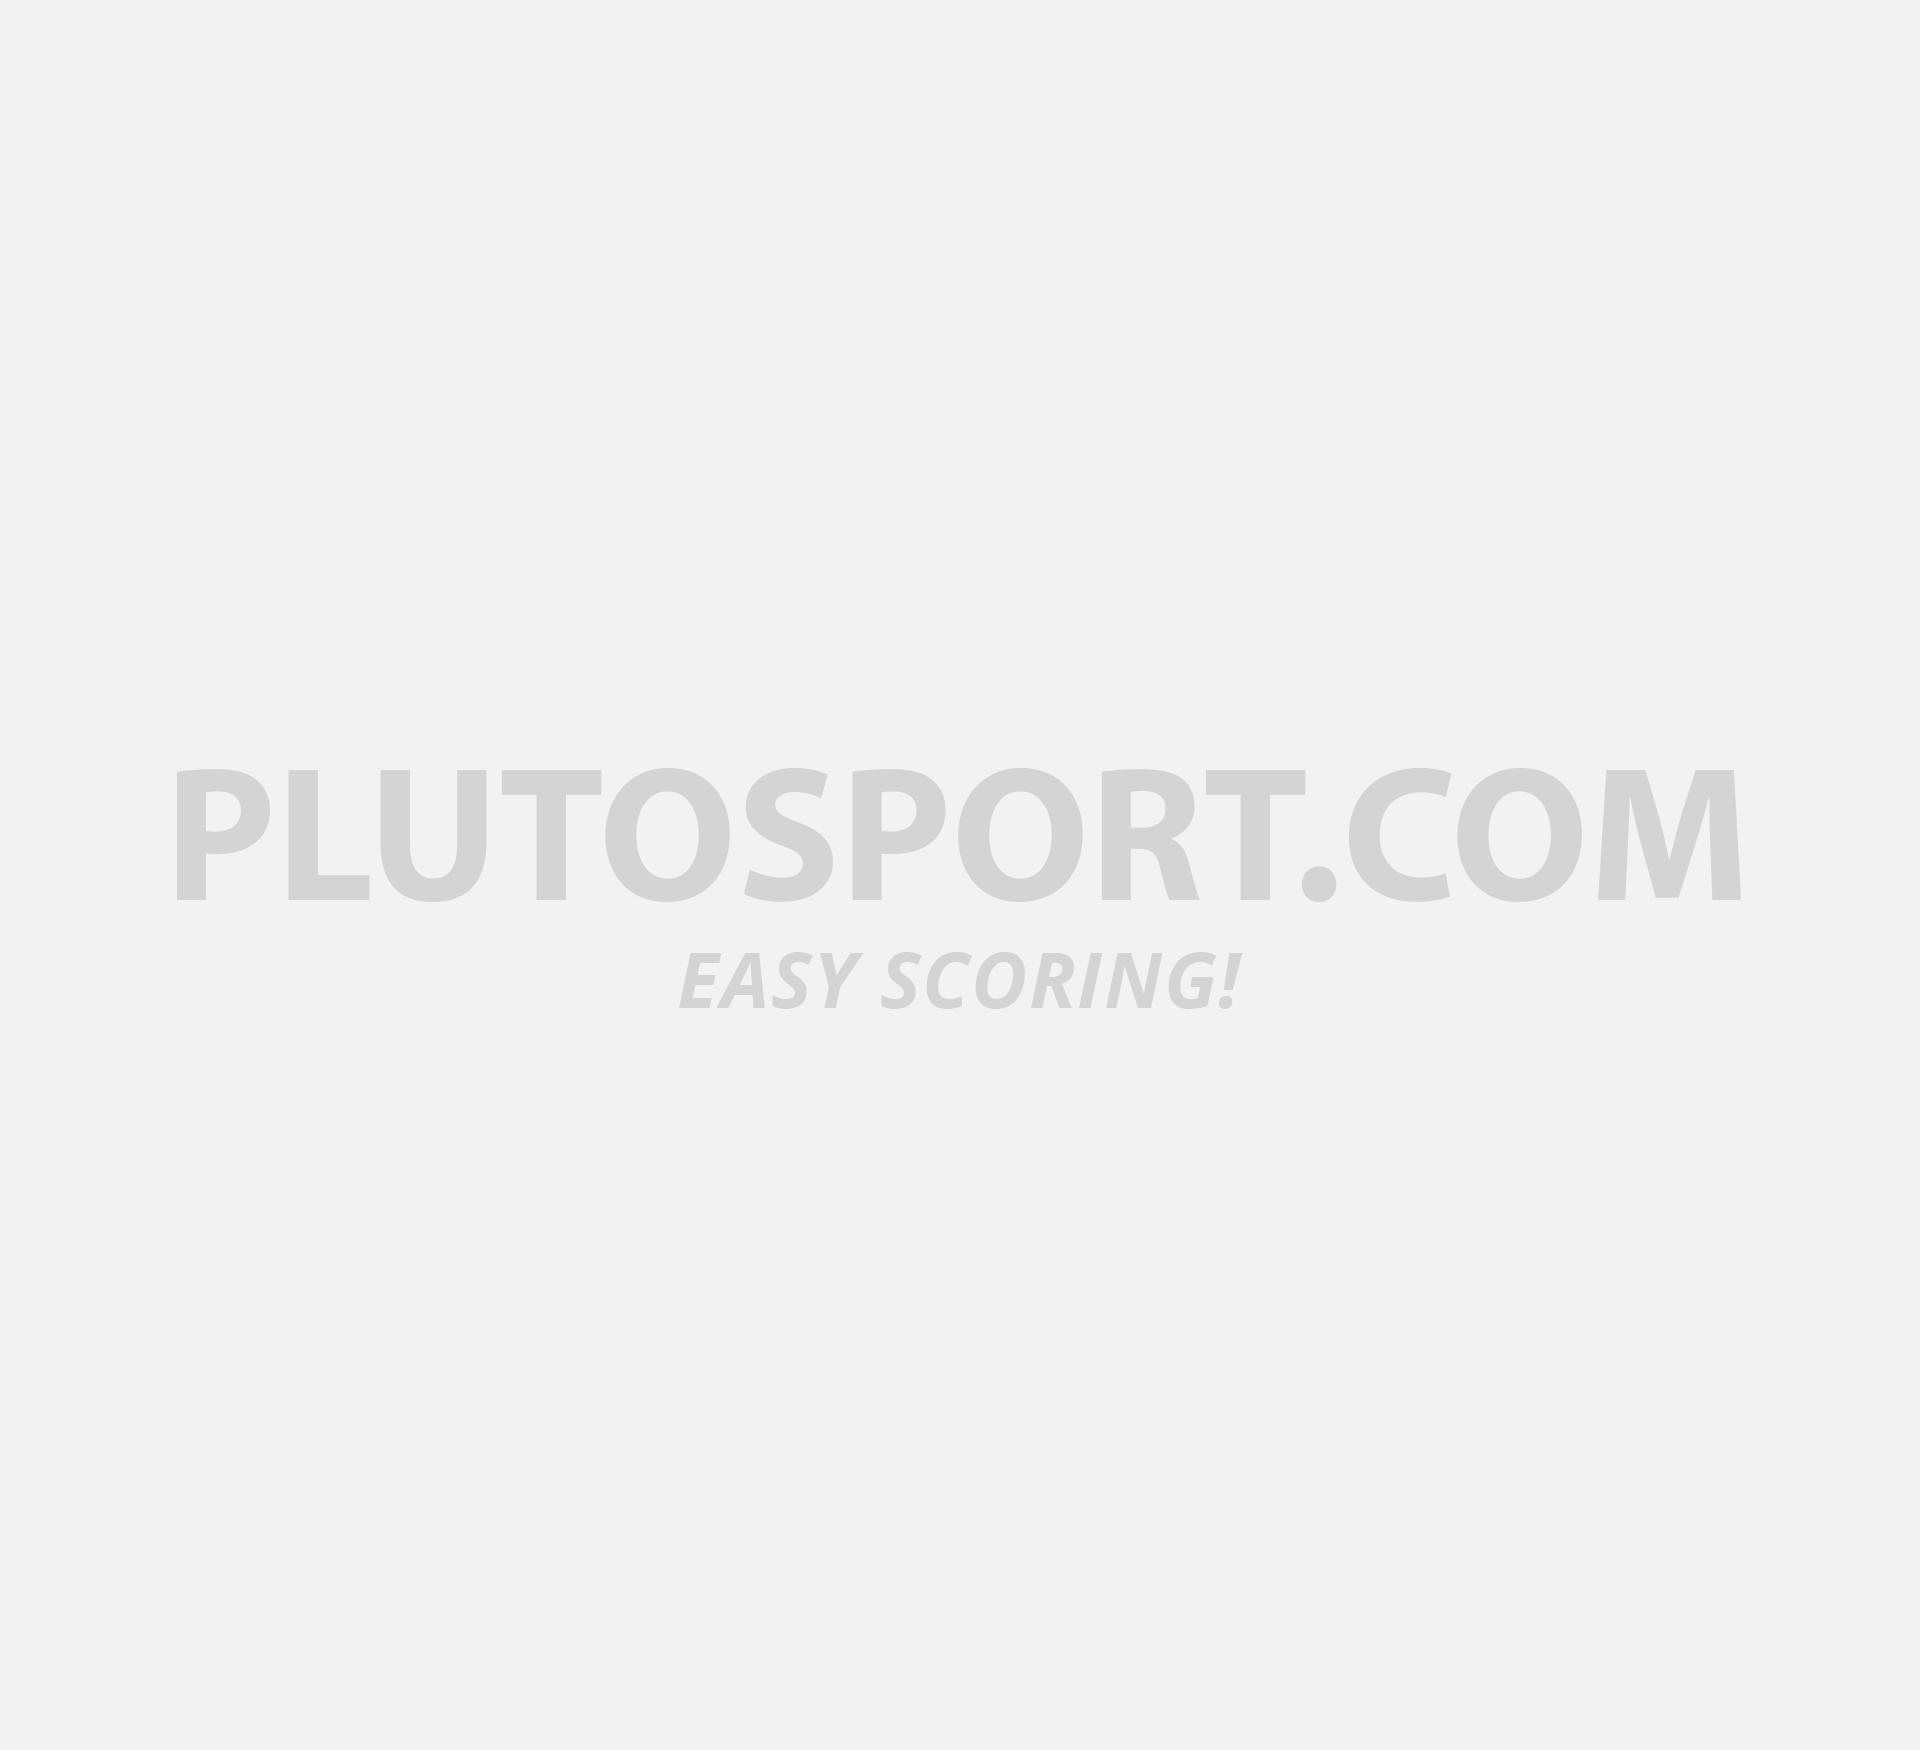 adidas mundial team trova prezzo